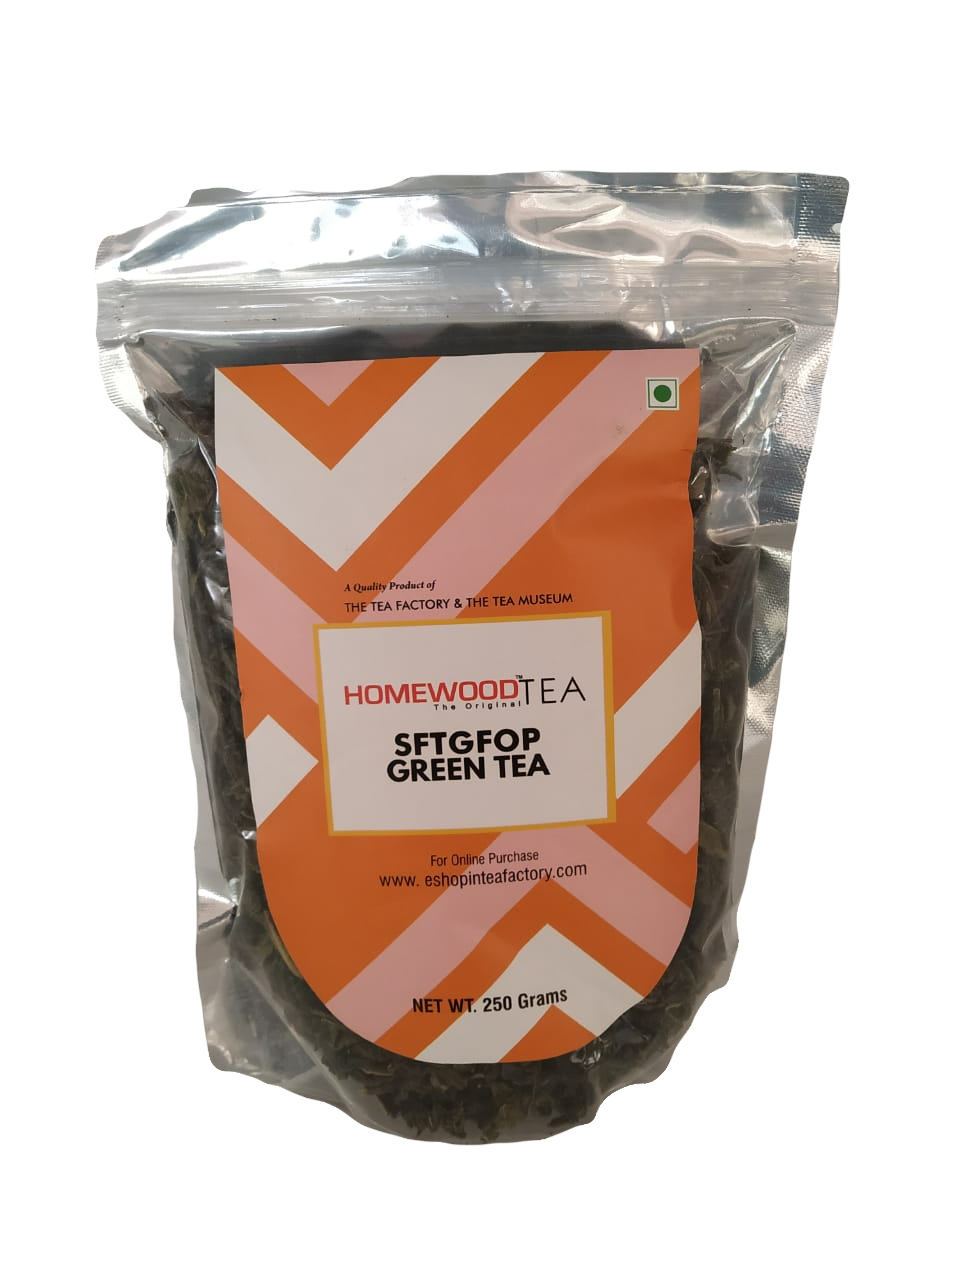 Homewood Green Tea SFTGFOP (Poly Pack)